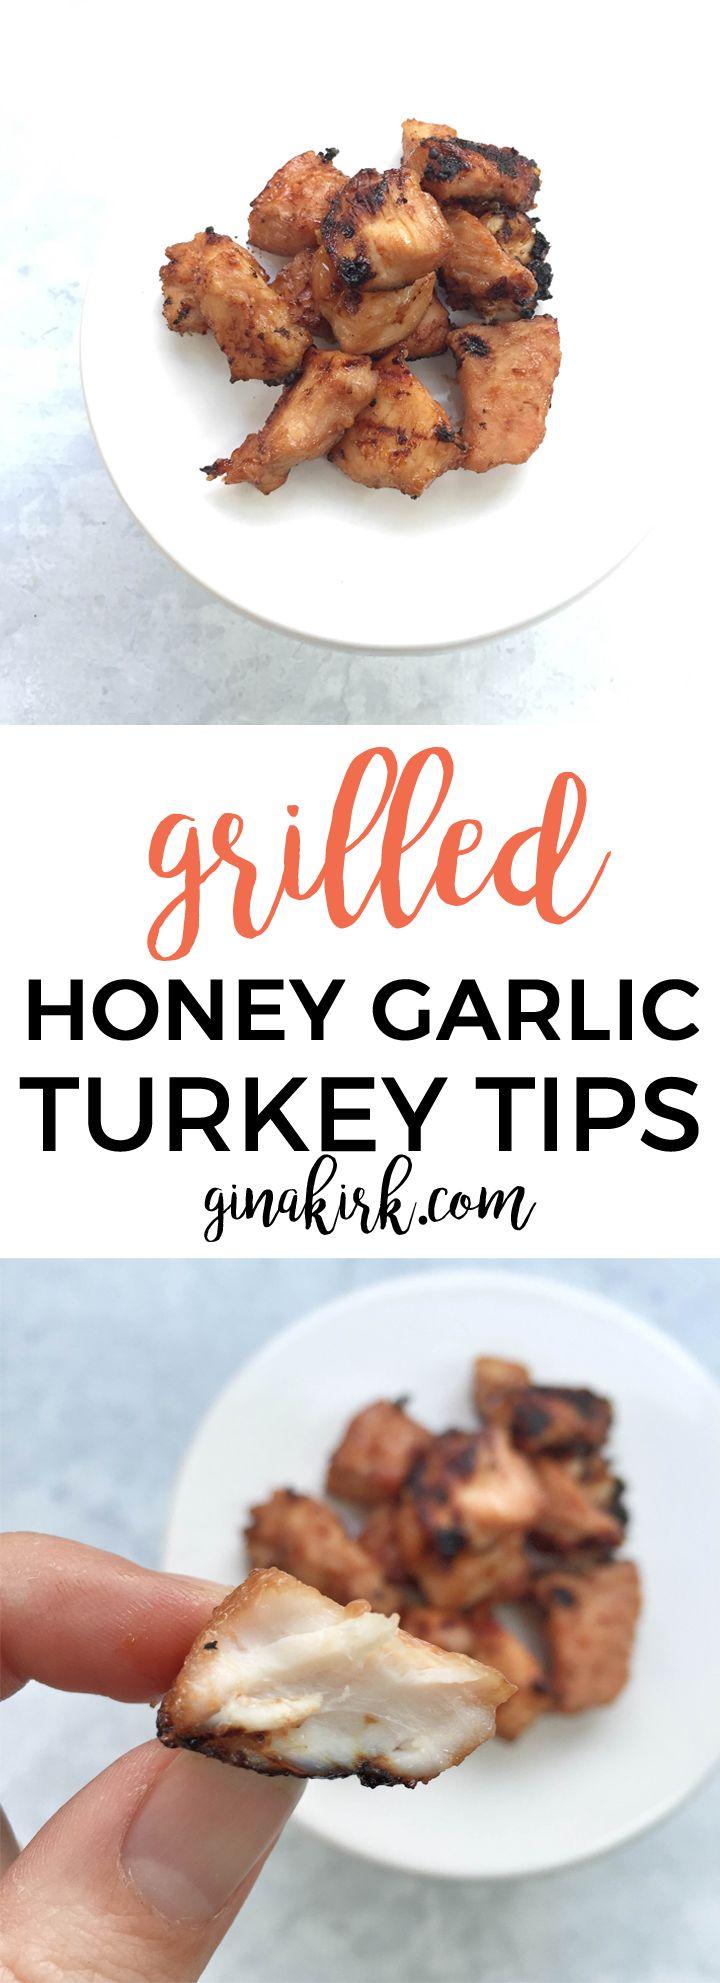 Grilled honey garlic turkey tips   Honey garlic sauce marinade recipe ~ use it on chicken, beef, or turkey tips for dinner!   GinaKirk.com @ginaekirk